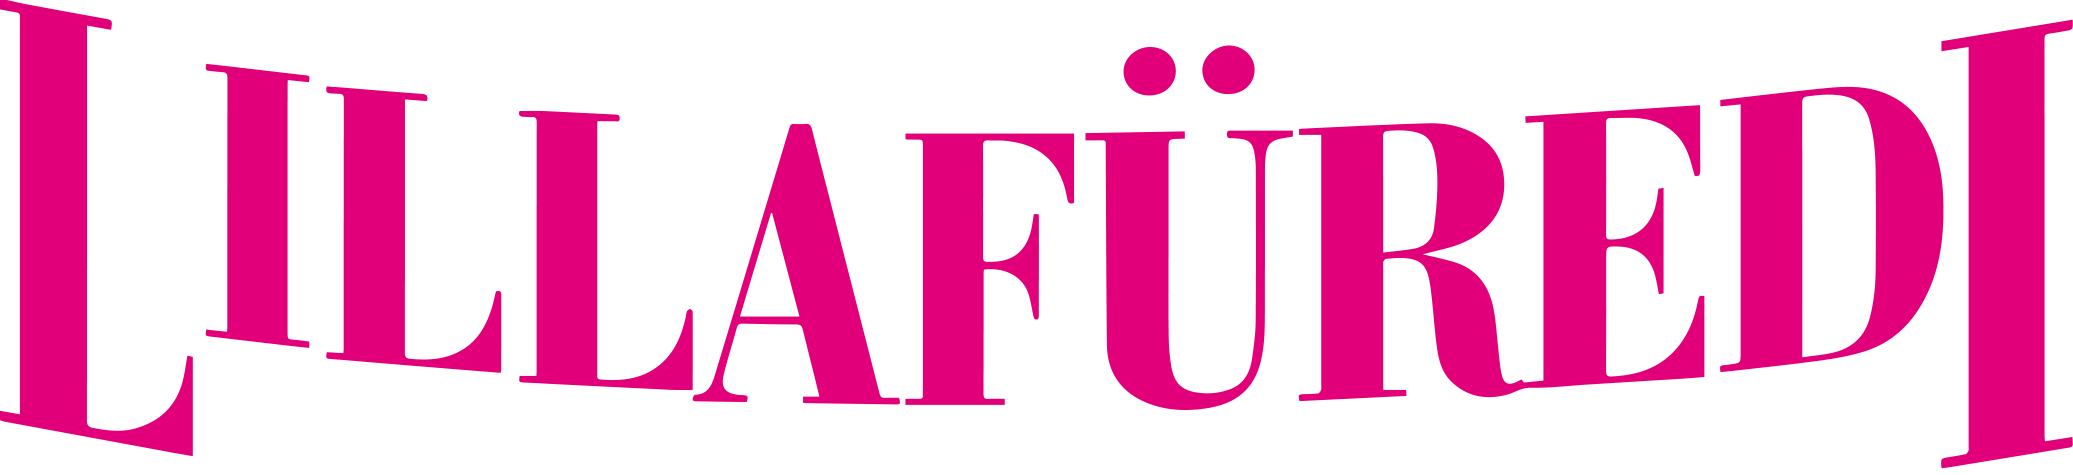 Lilafüredi logo